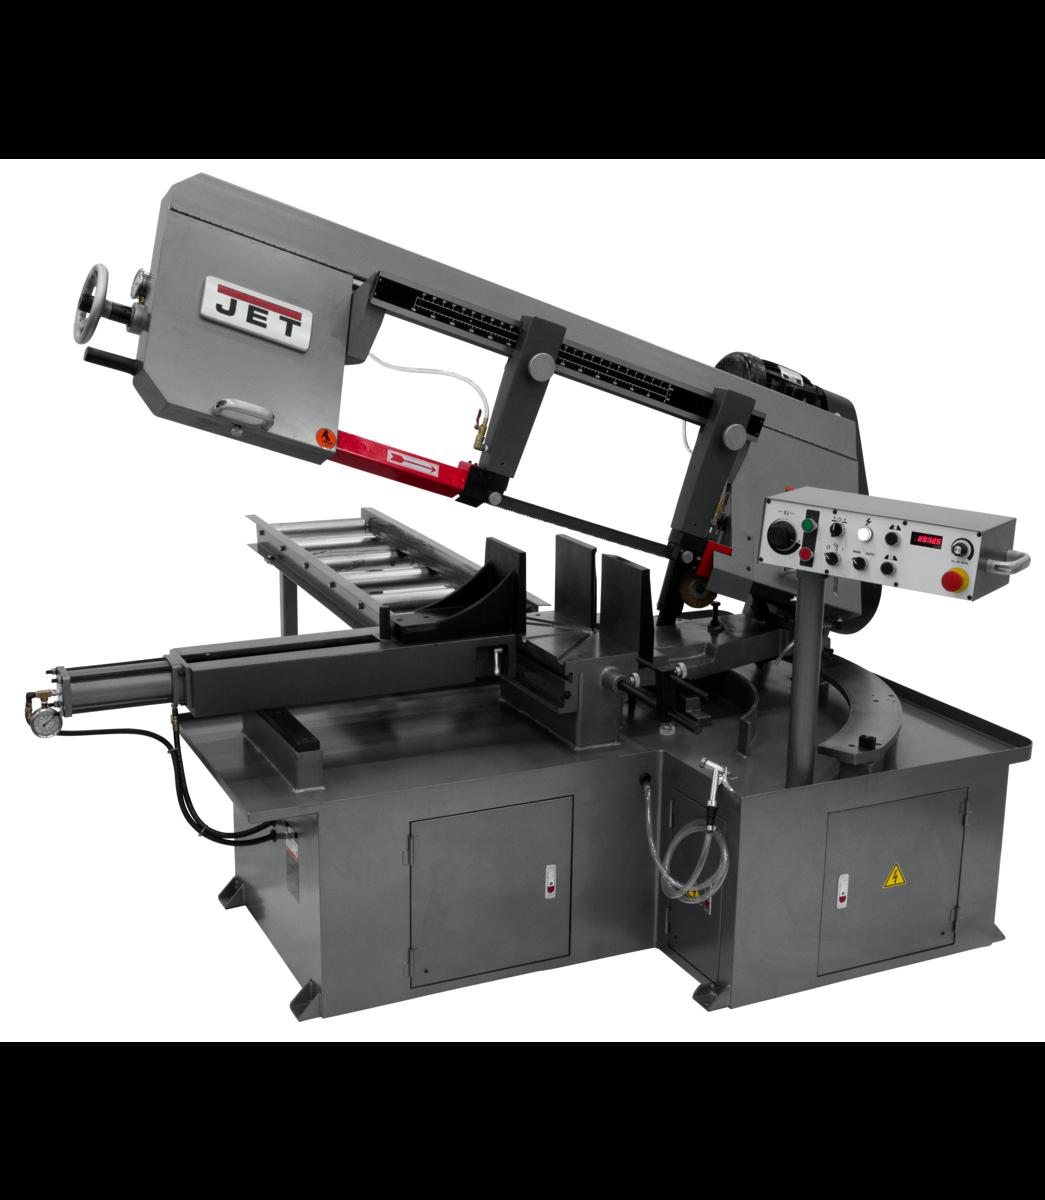 MBS-1323EVS-H-4, Semi-Automatic Dual Mitering Bandsaw 3HP 460V3HP 460V, 3-Ph